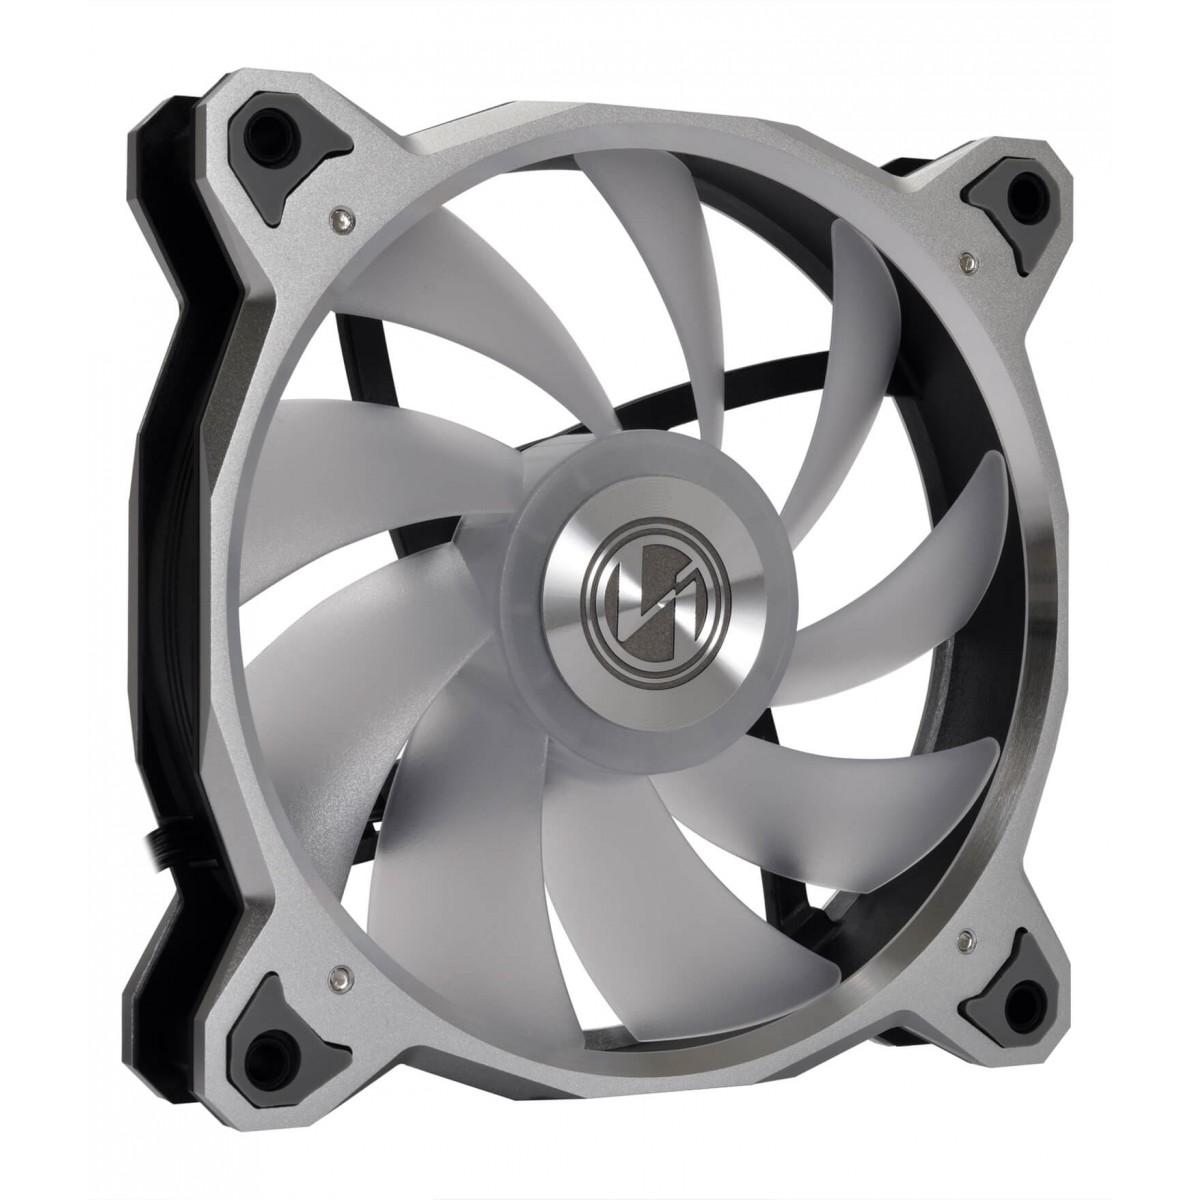 Kit Fan com 3 Unidades Lian Li Bora Digital Silver, RGB 120mm, BR DIGITAL-3R S